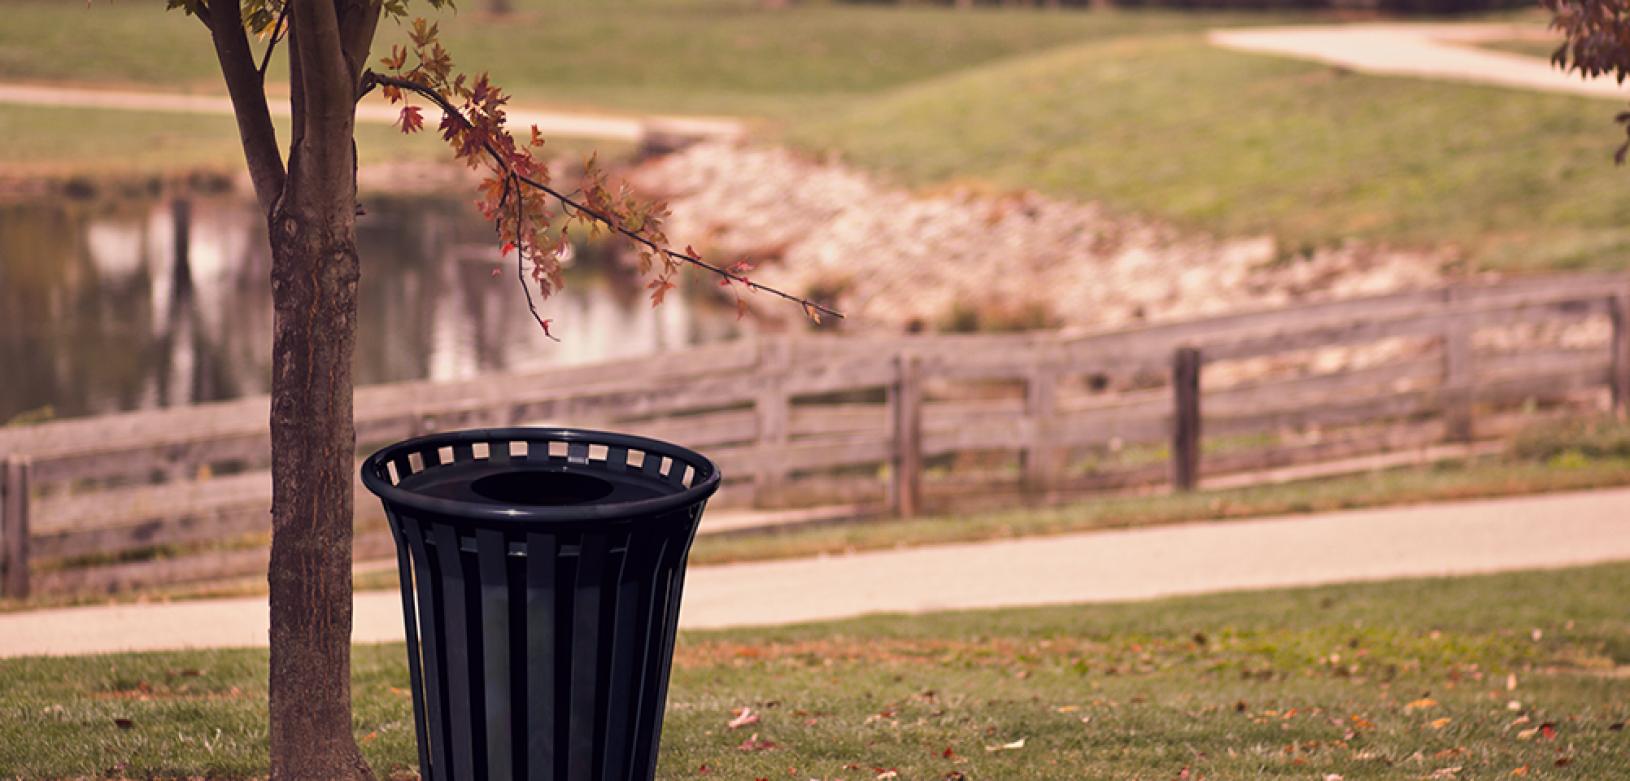 Witt Black Oakley Standard Outdoor Receptacle Environmental